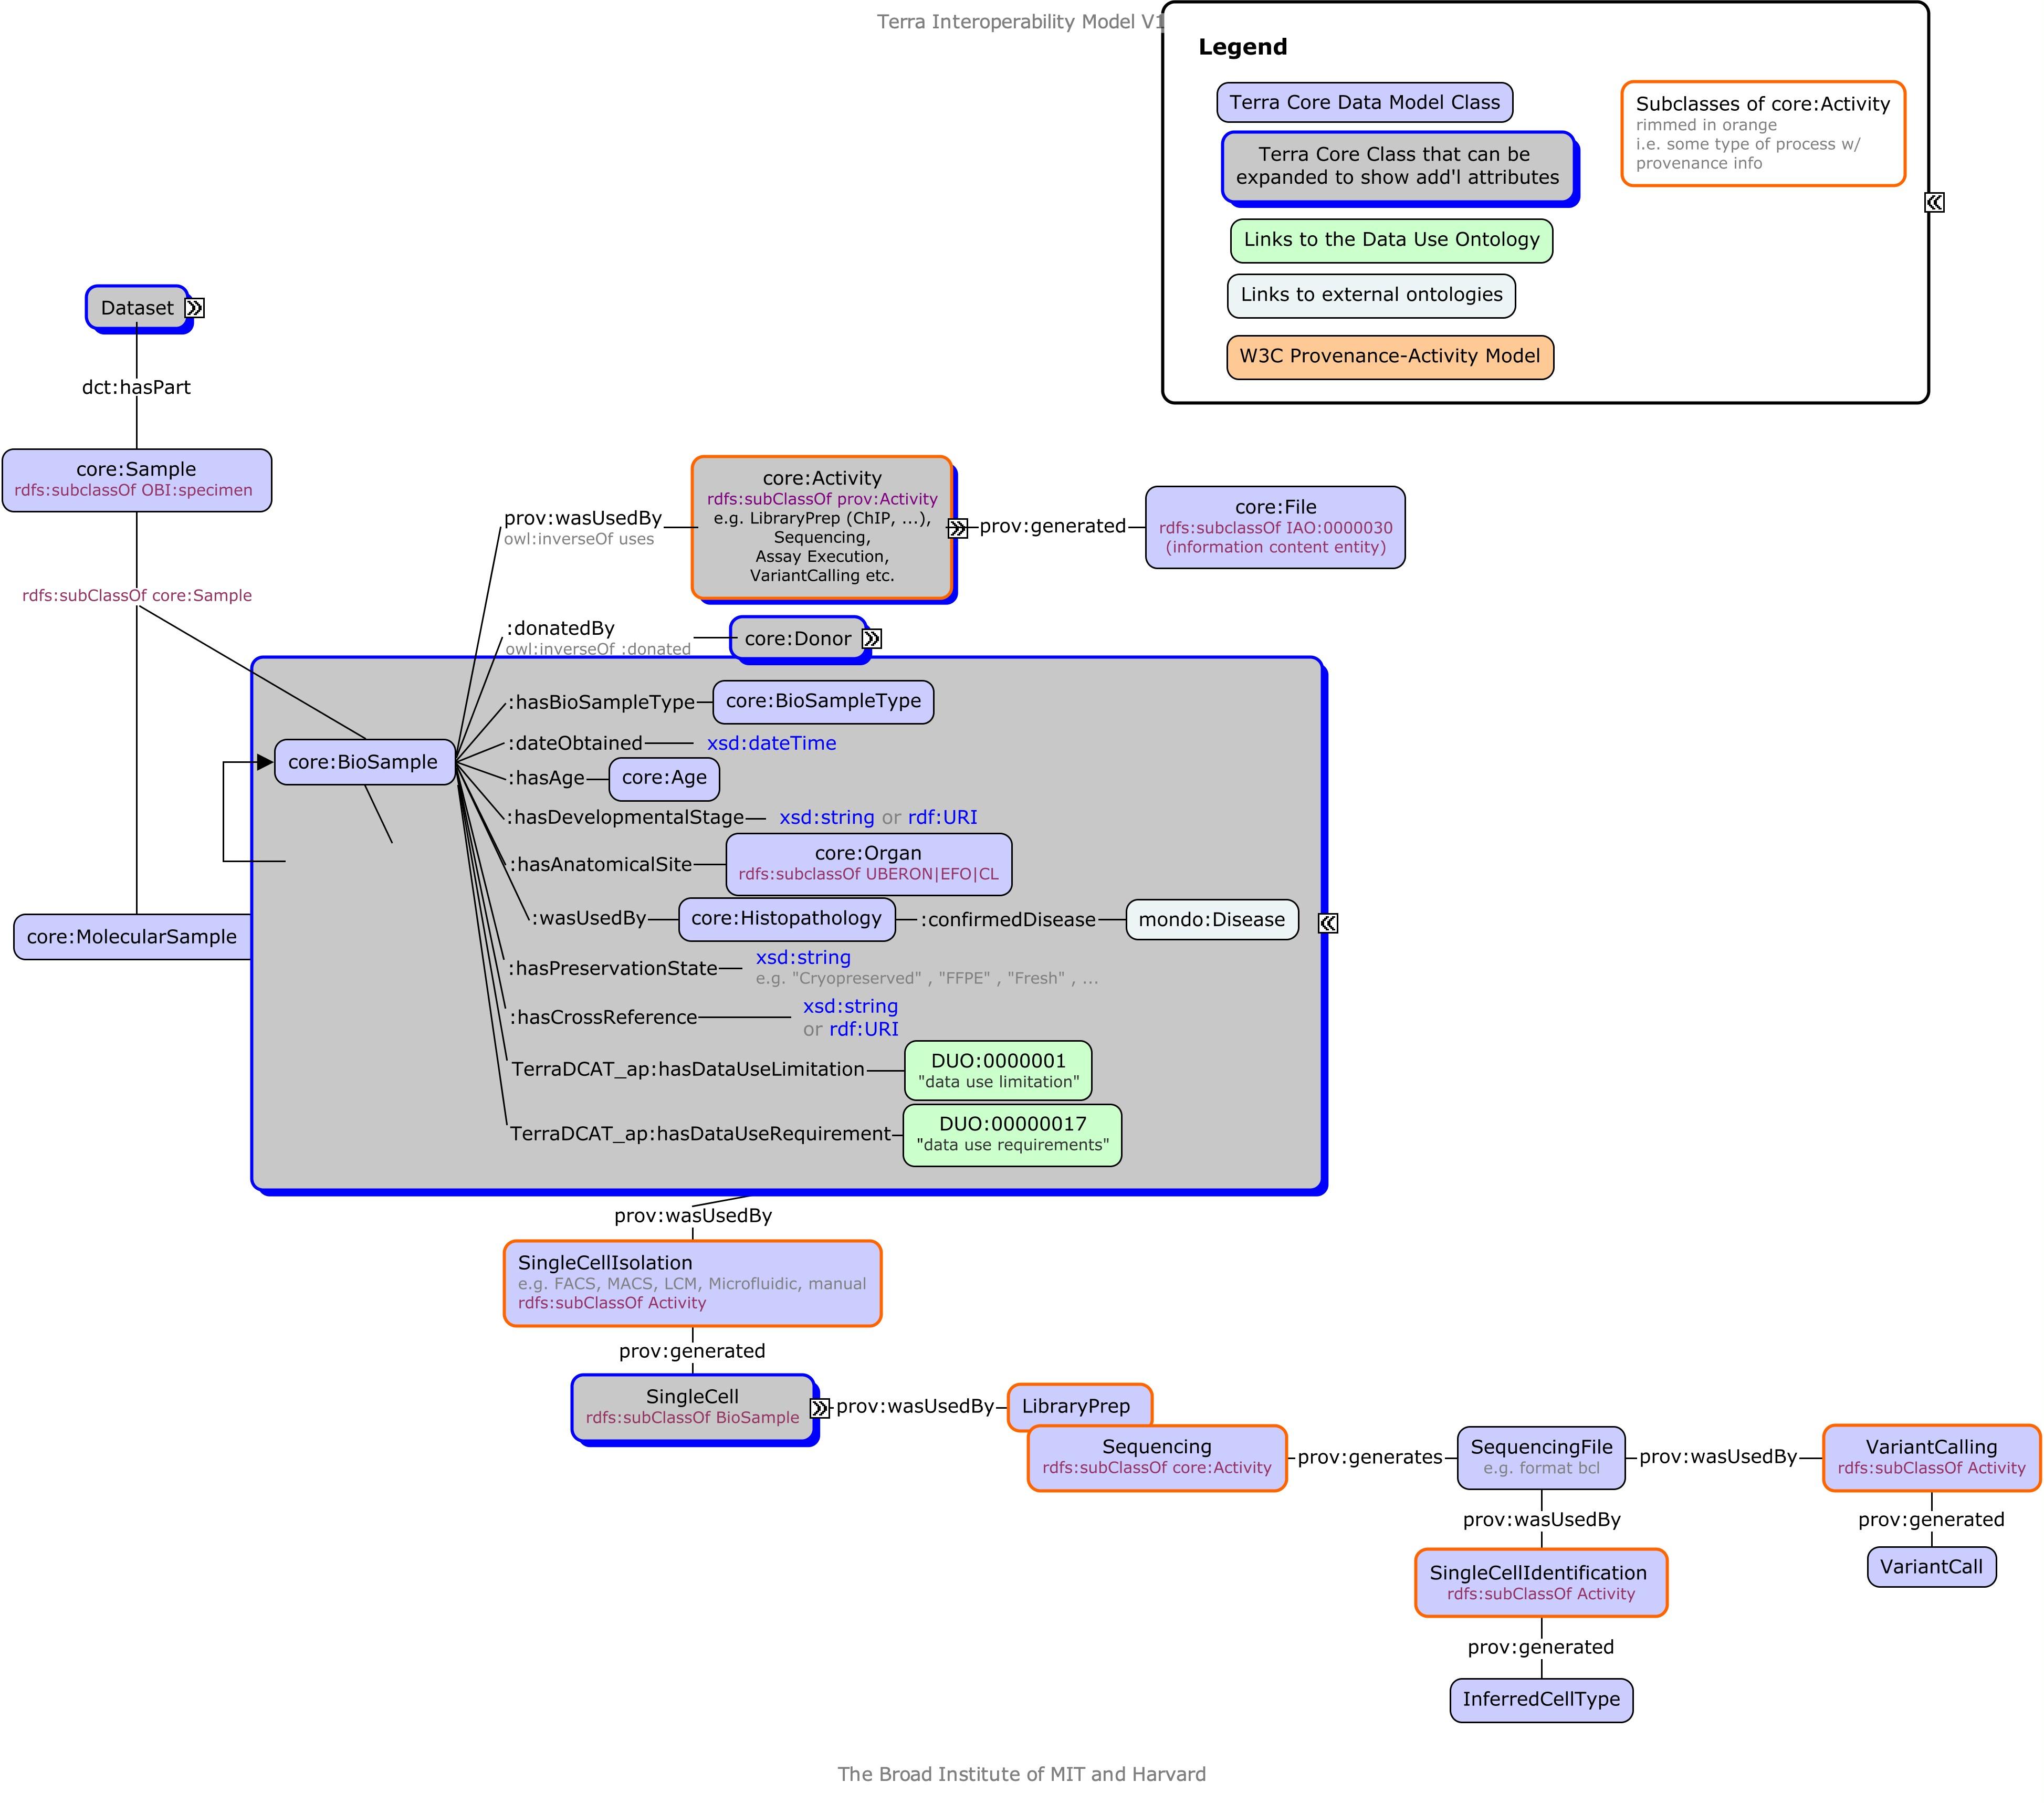 Figure - Terra Interoperability Model Overview Draft